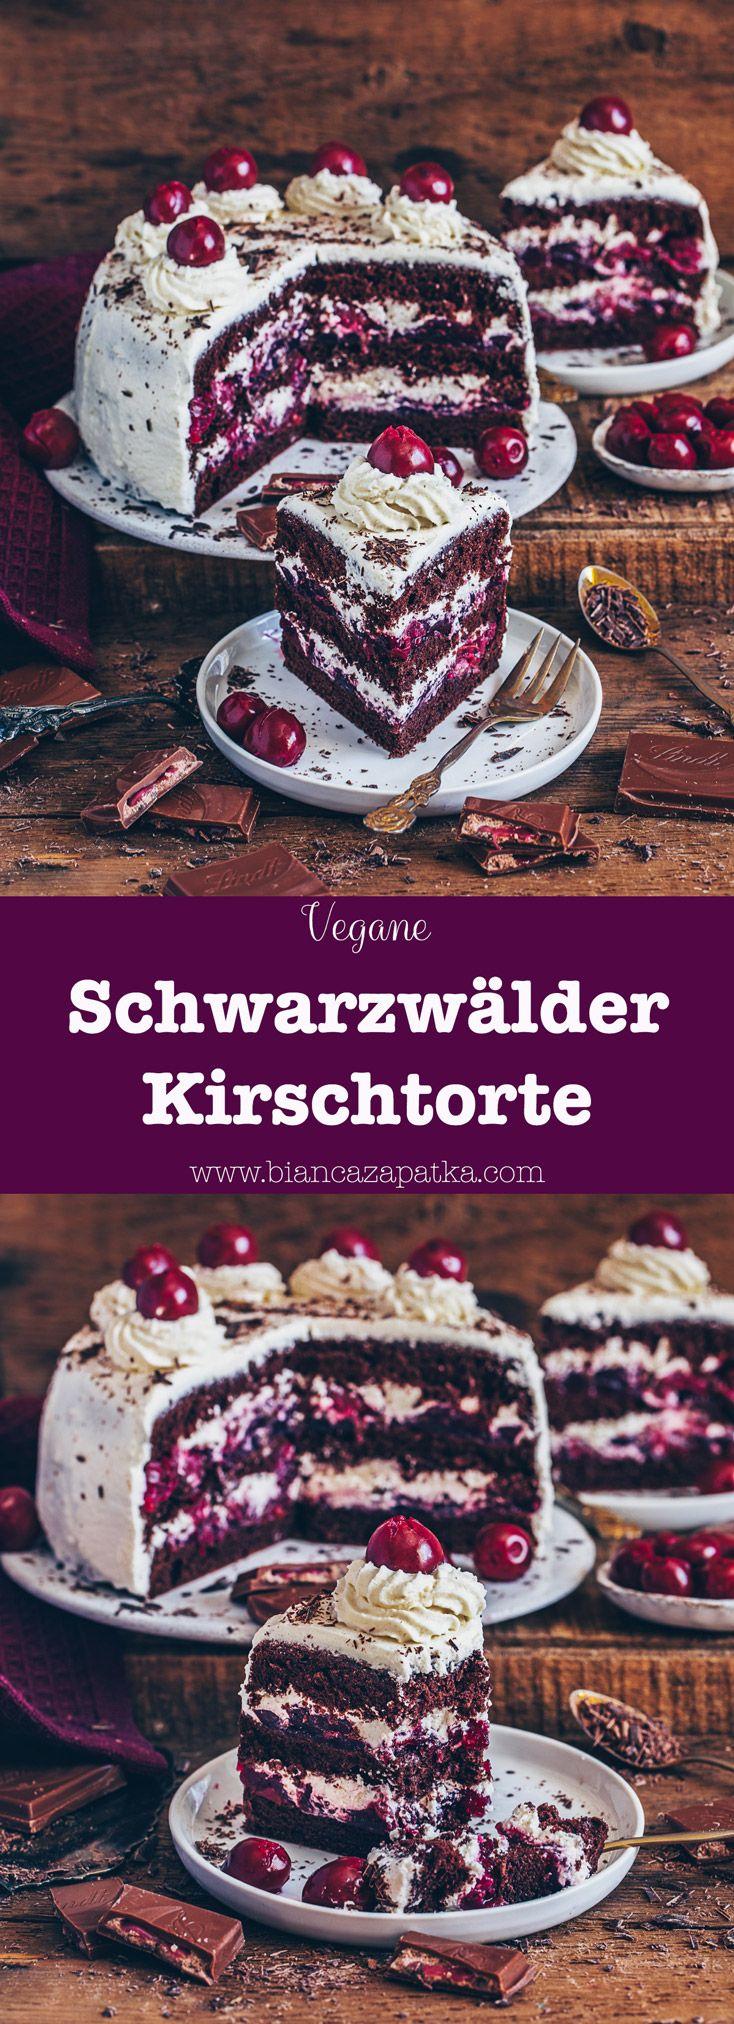 Vegane Schwarzwälder Kirschtorte (einfaches Rezept) - Bianca Zapatka | Rezepte #spekulatiuskuchen